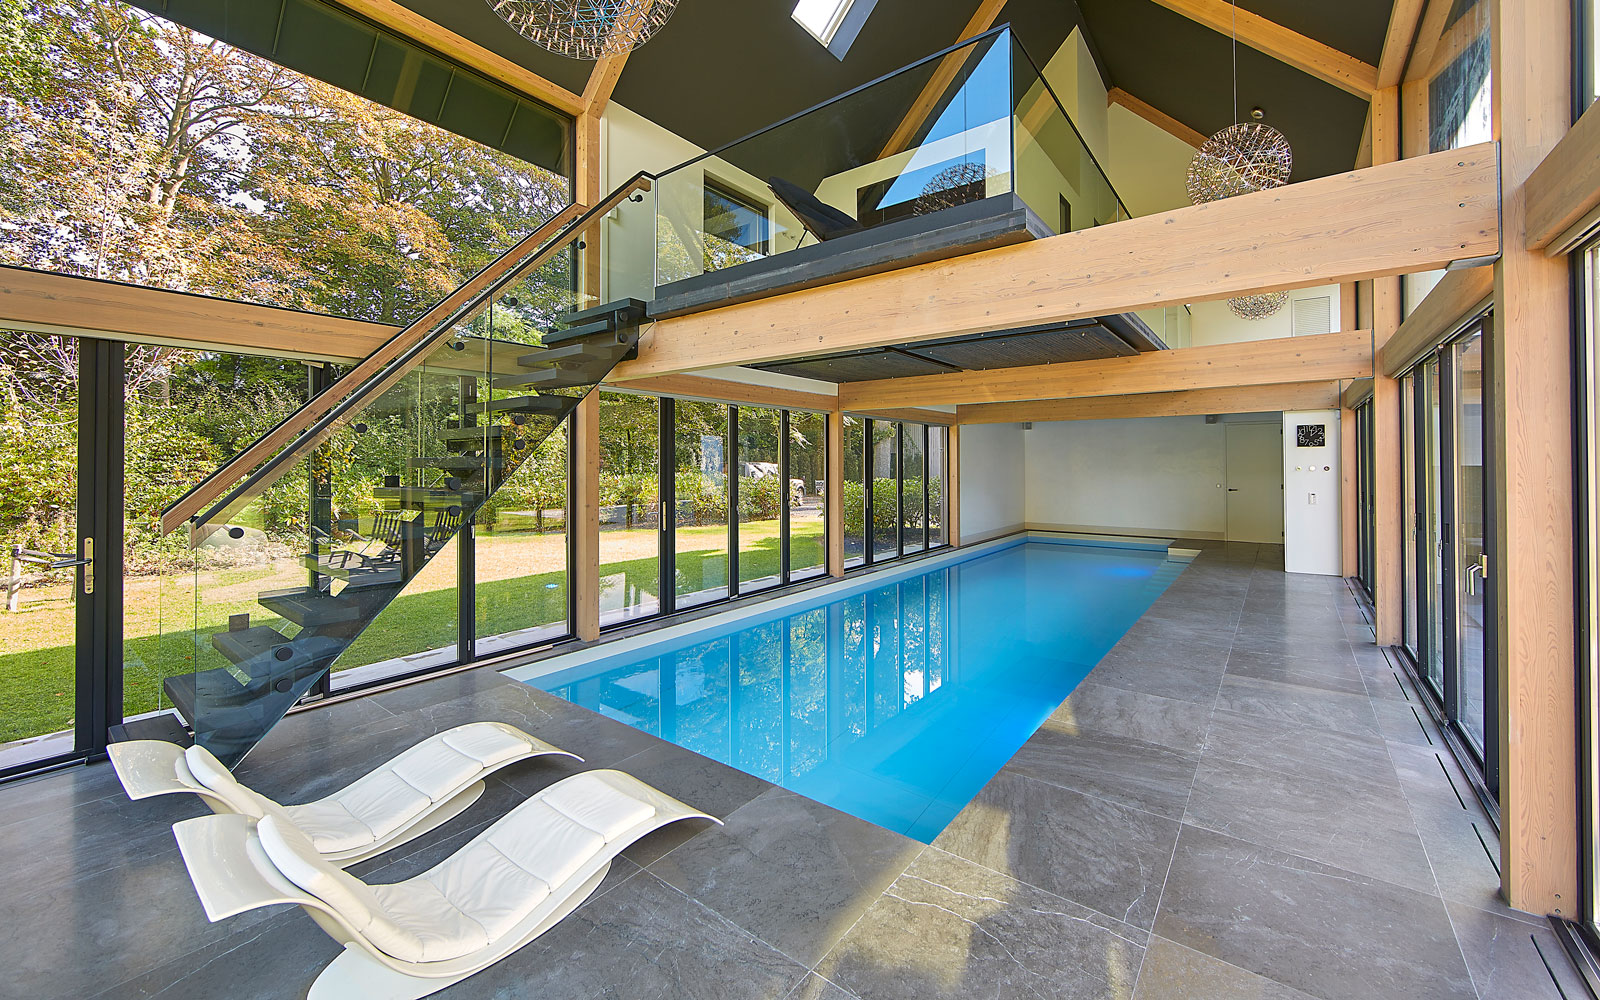 Zwembad, Waterstijl, verwarmd, wellness, relaxruimte, vide, symmetrische villa, PBV Architects, Contrasten